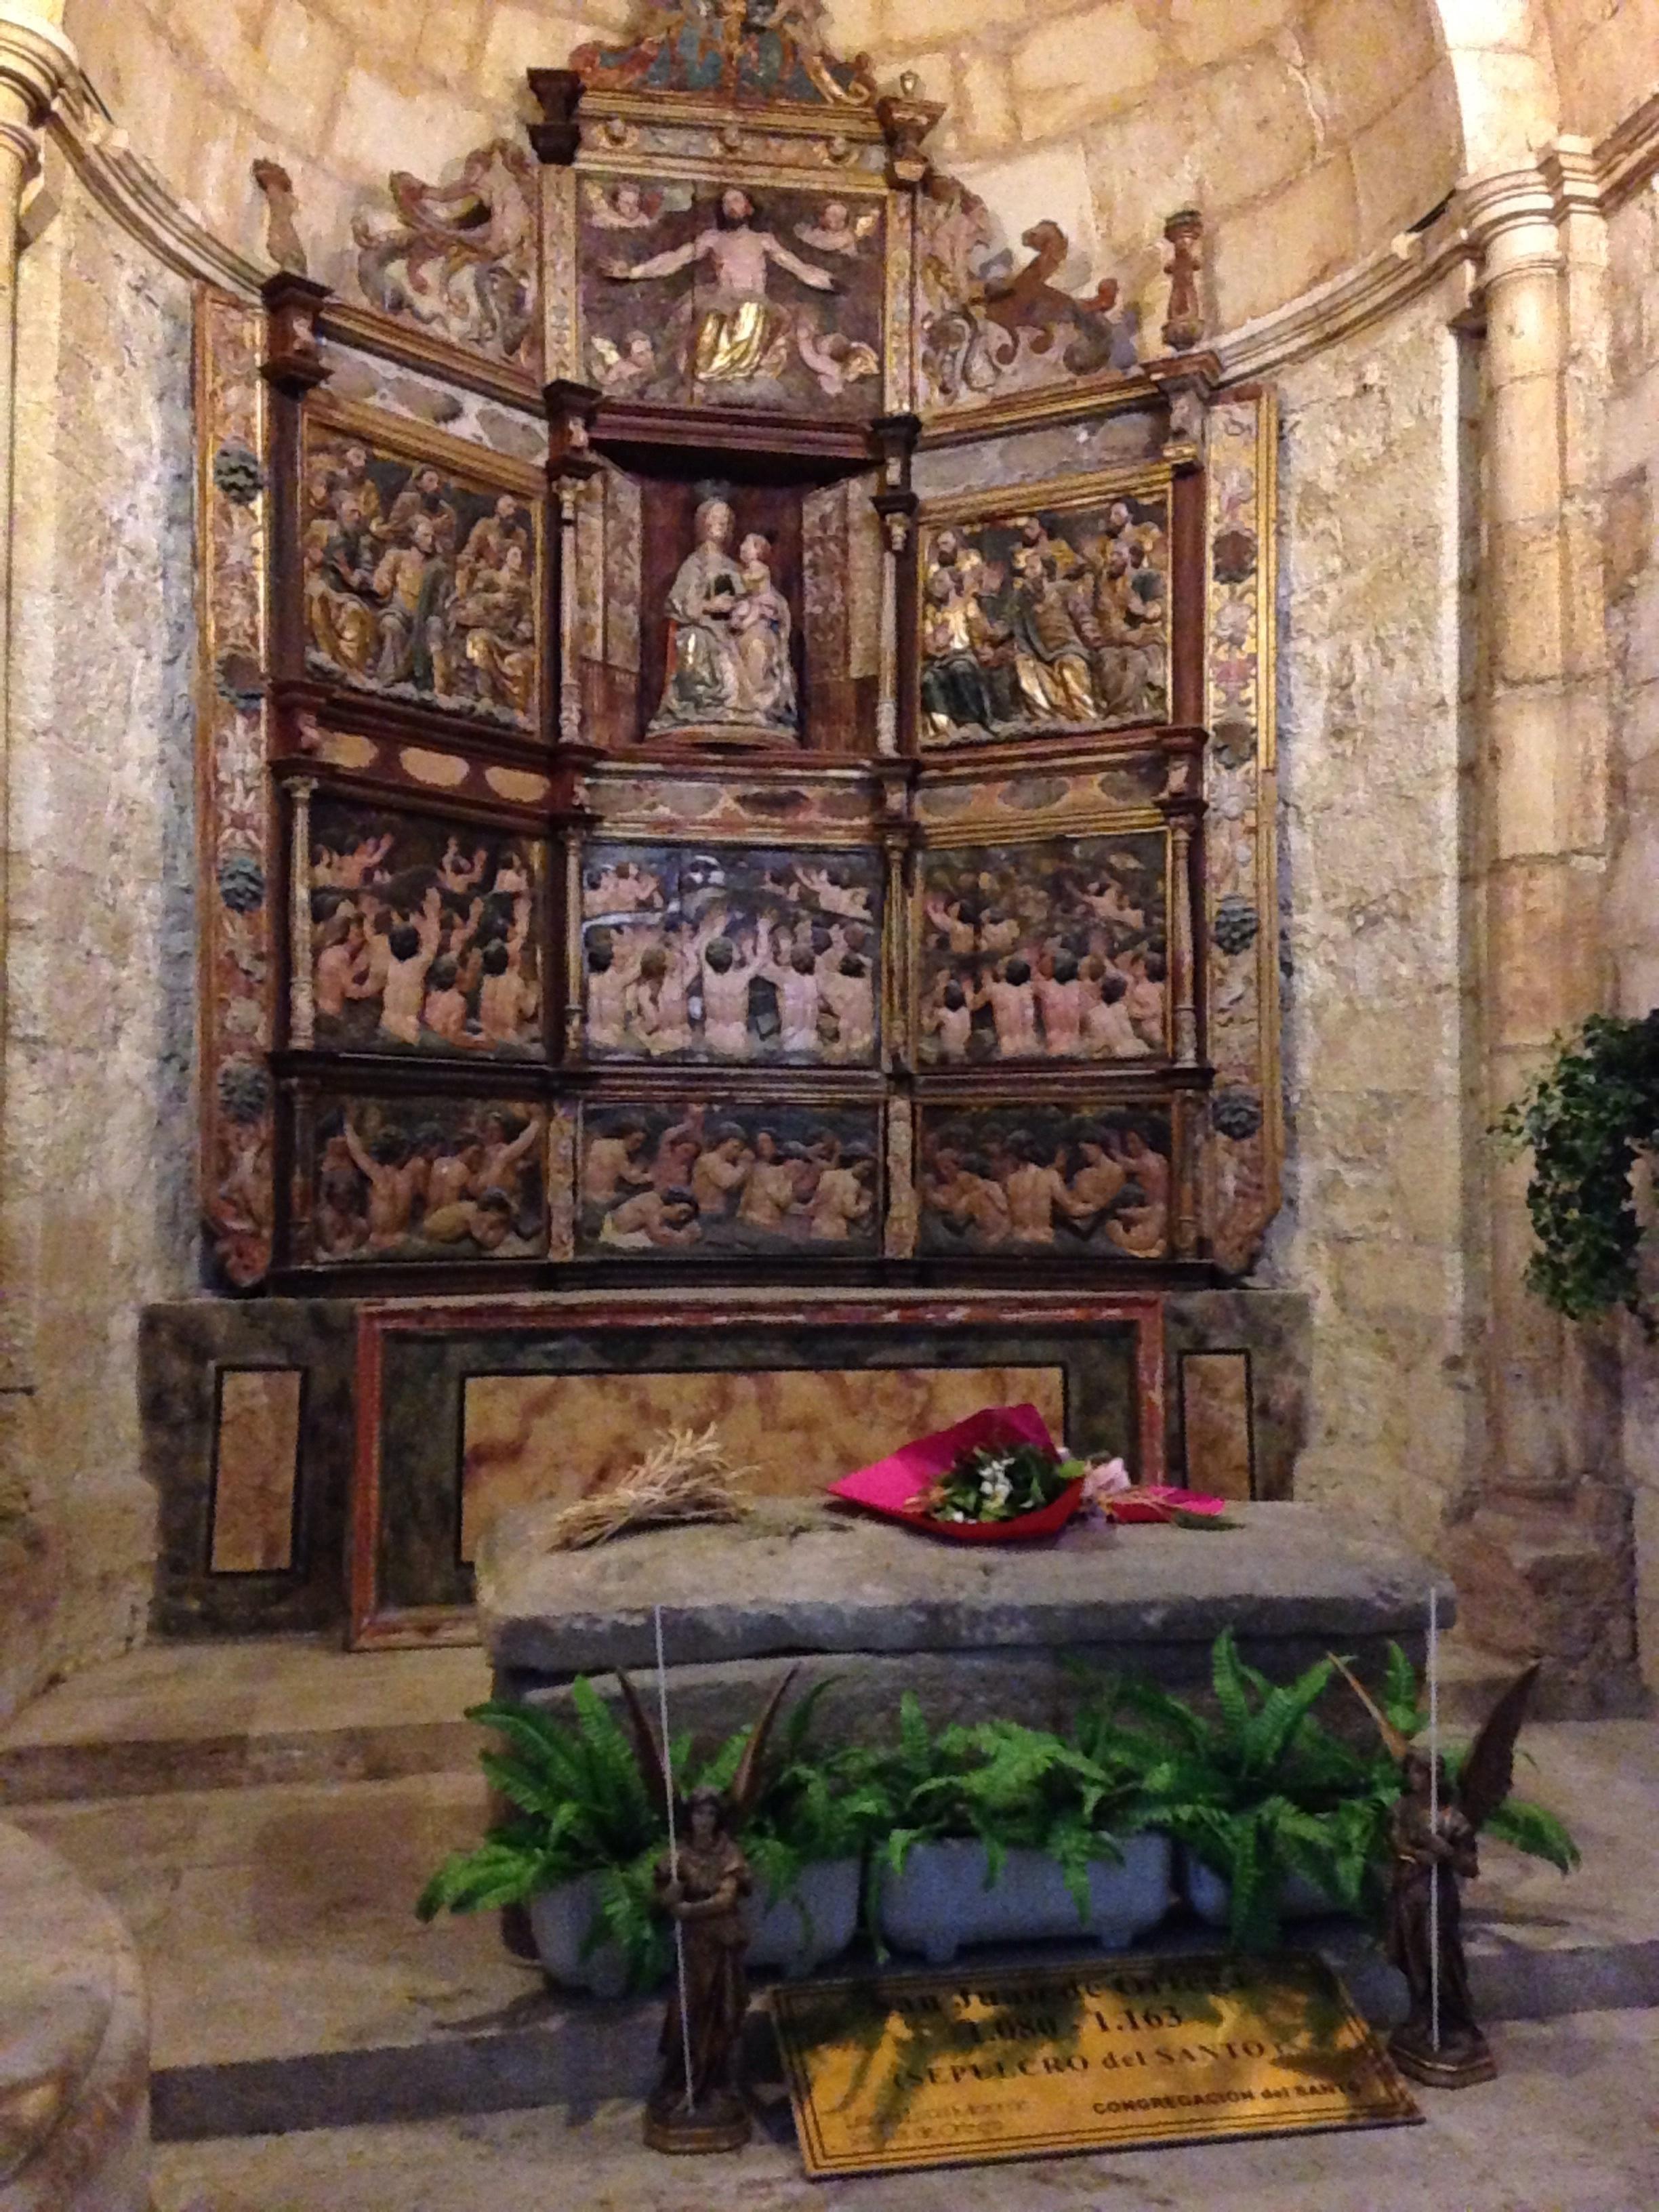 San Juan de Ortega's simple tomb. In the 1100s he dedicated his life to loping pilgrims reach Santiago in one piece